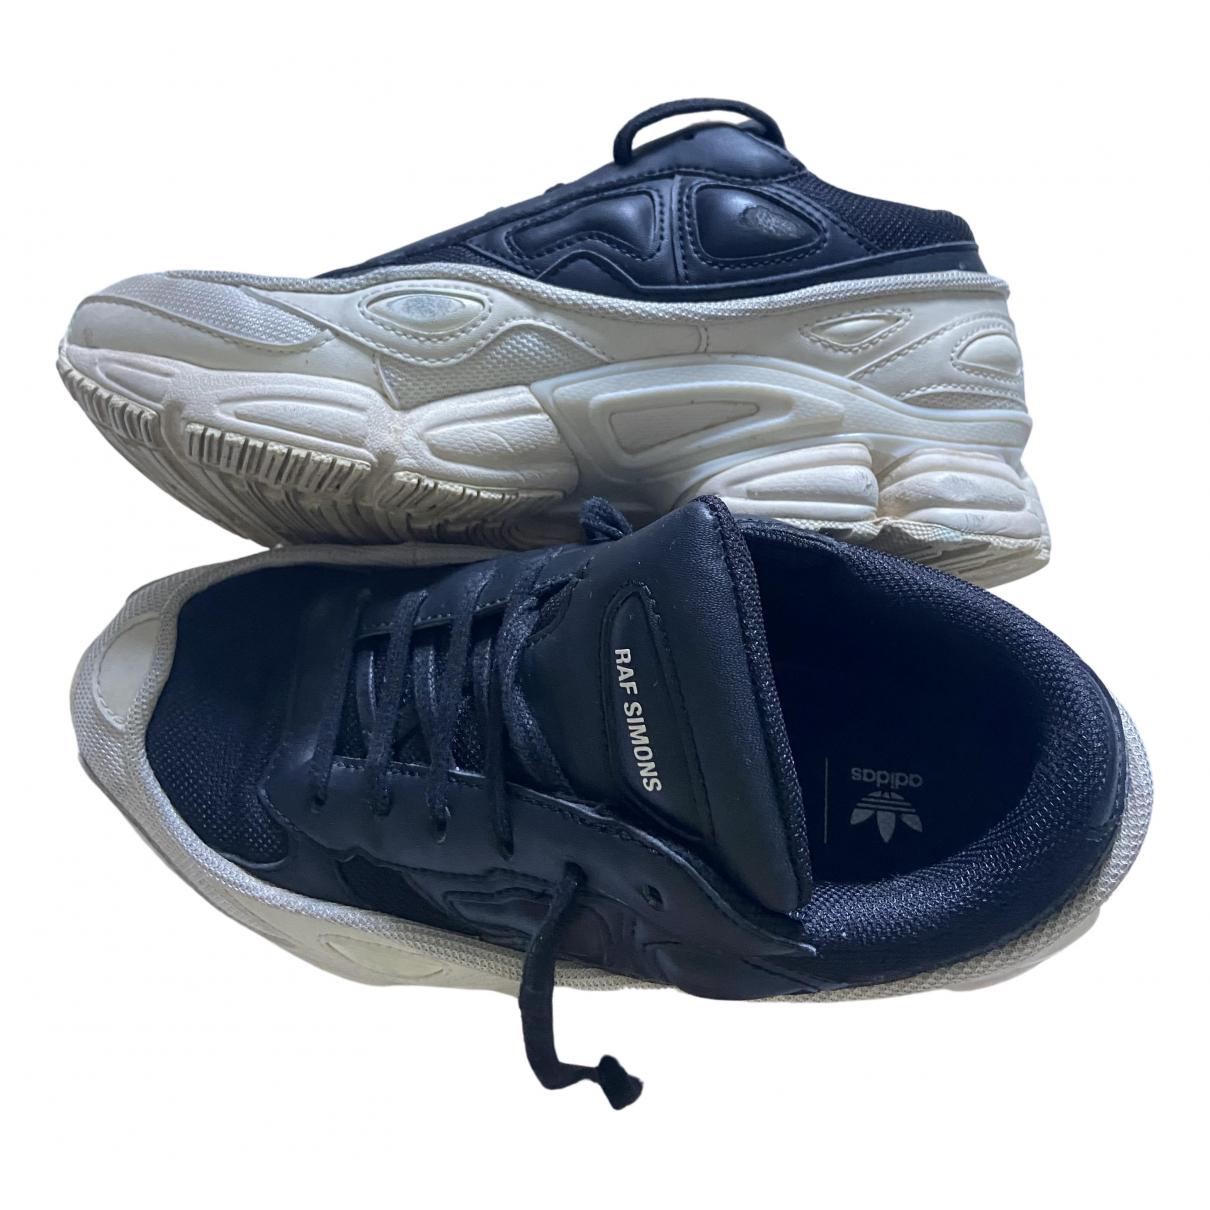 Adidas X Raf Simons - Baskets RS Ozweego pour femme - noir